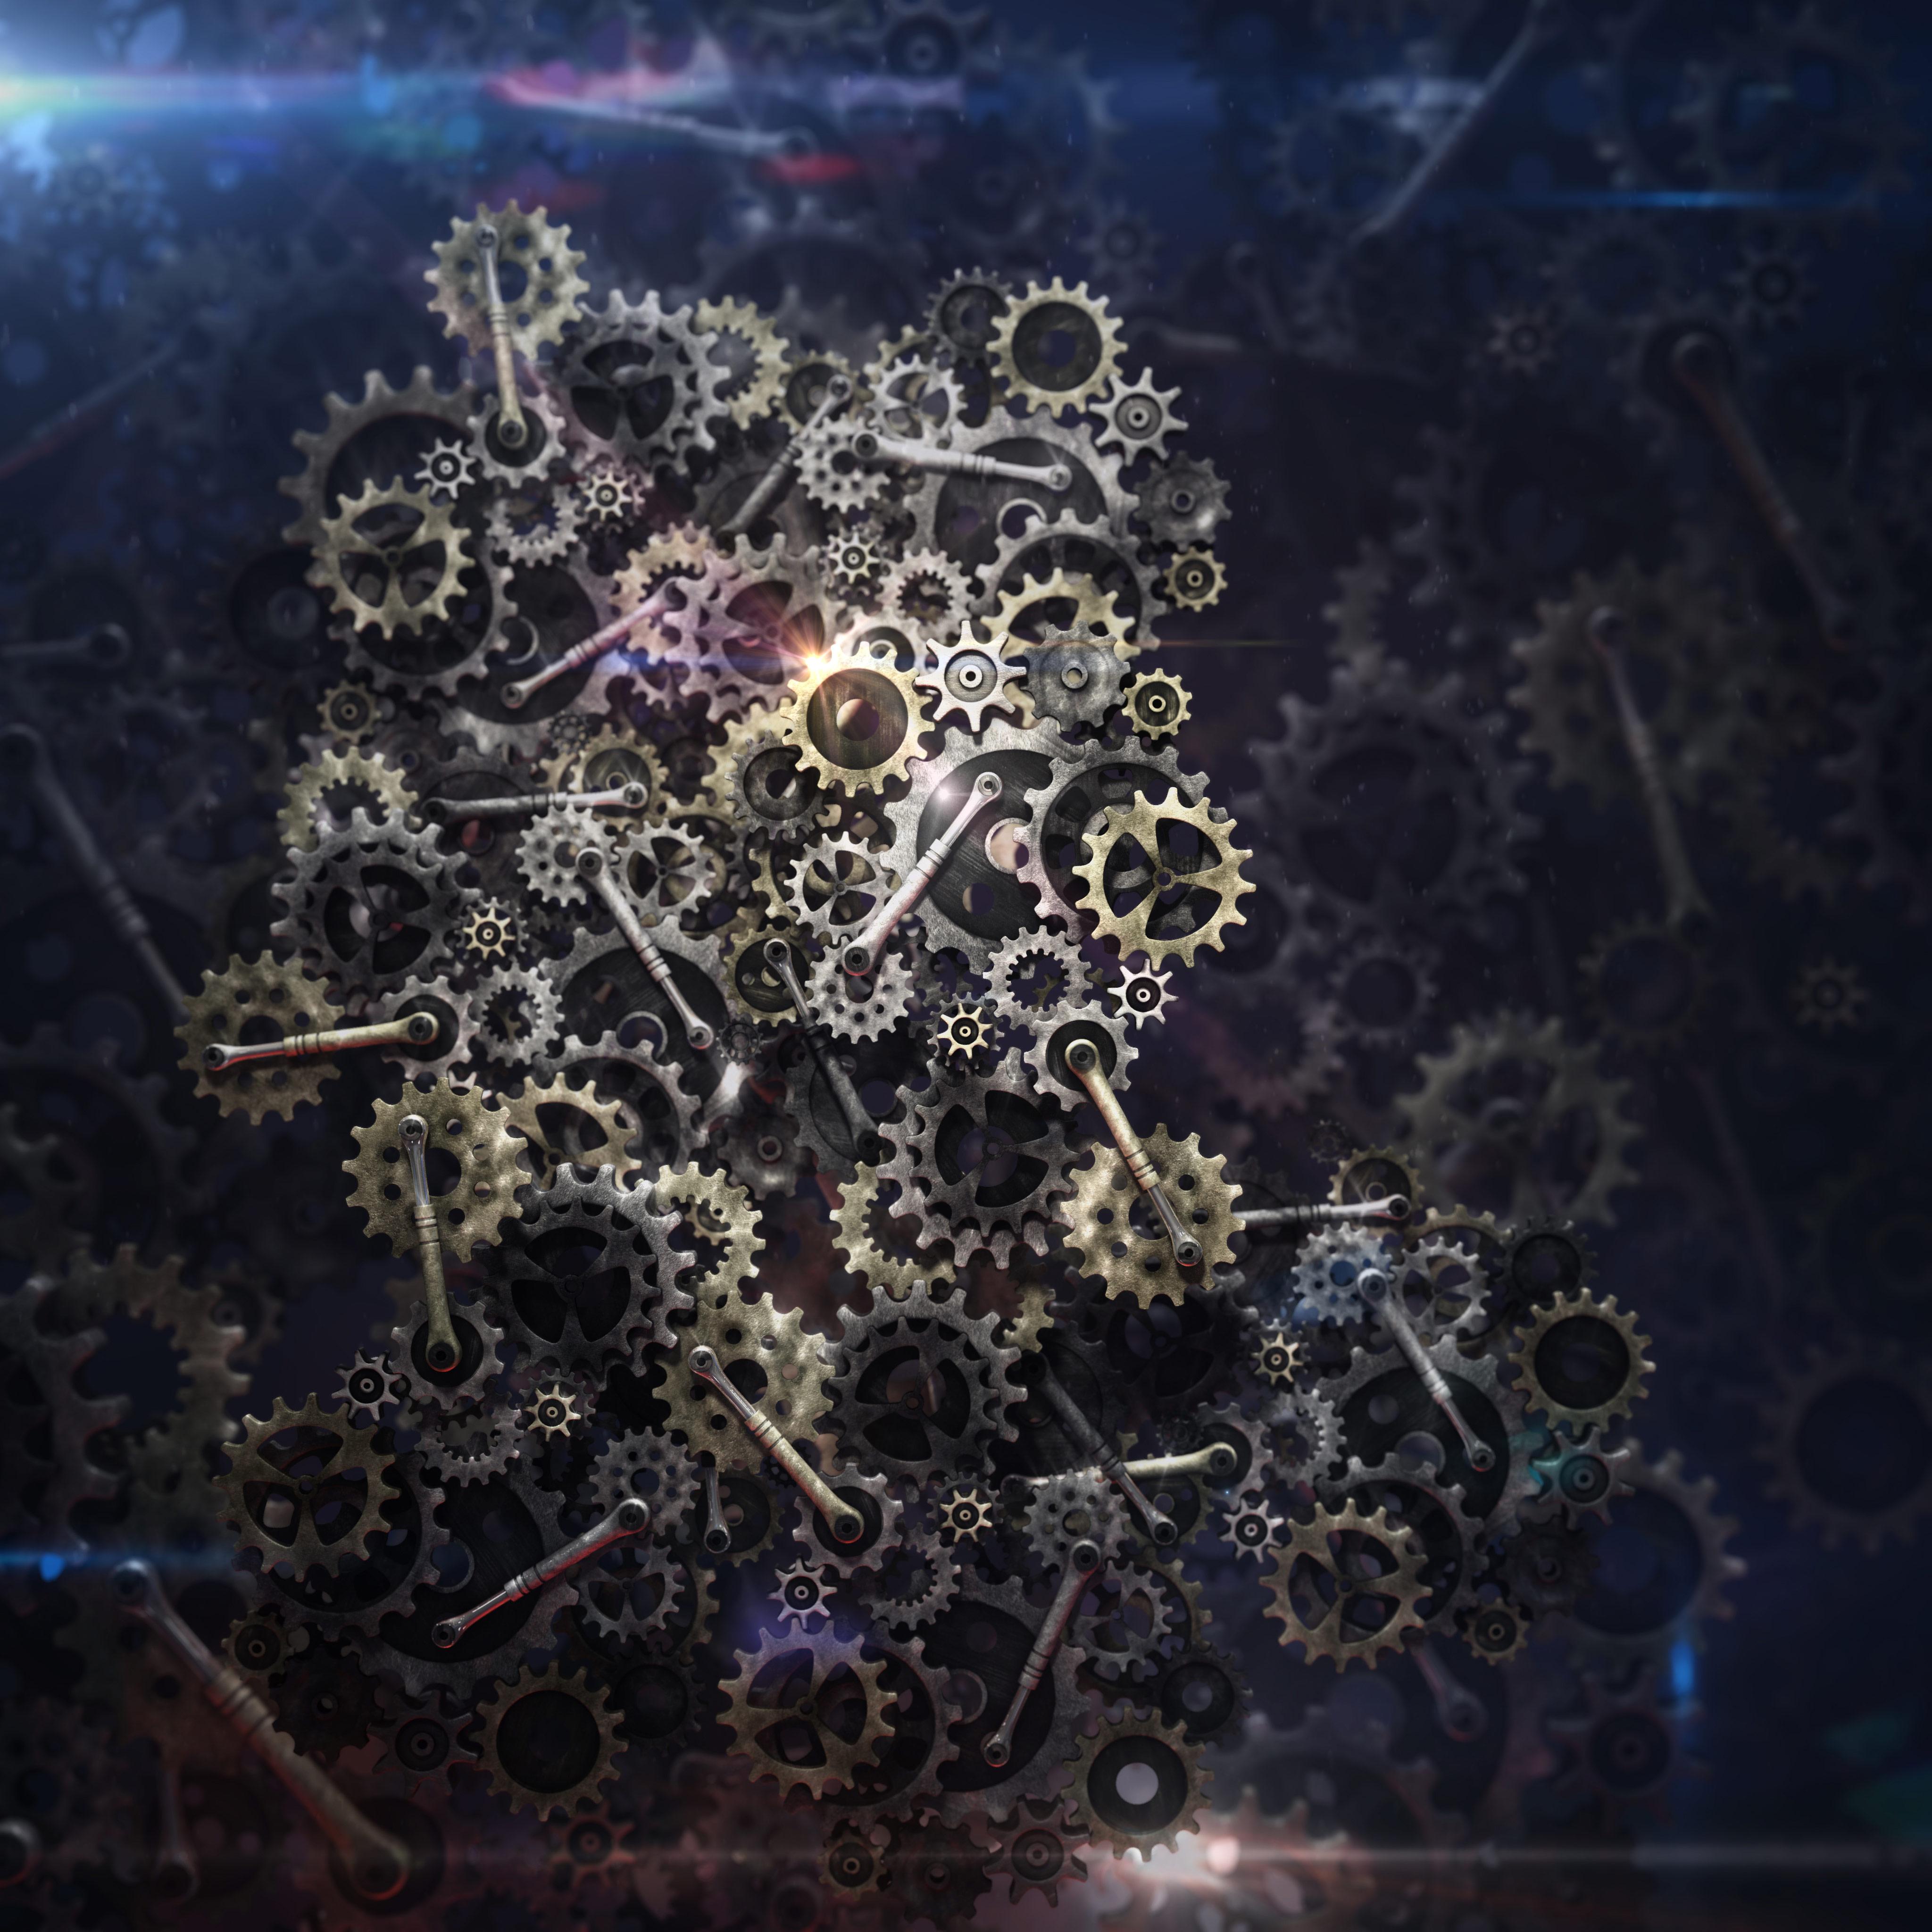 nanjingGearsFullSm-1